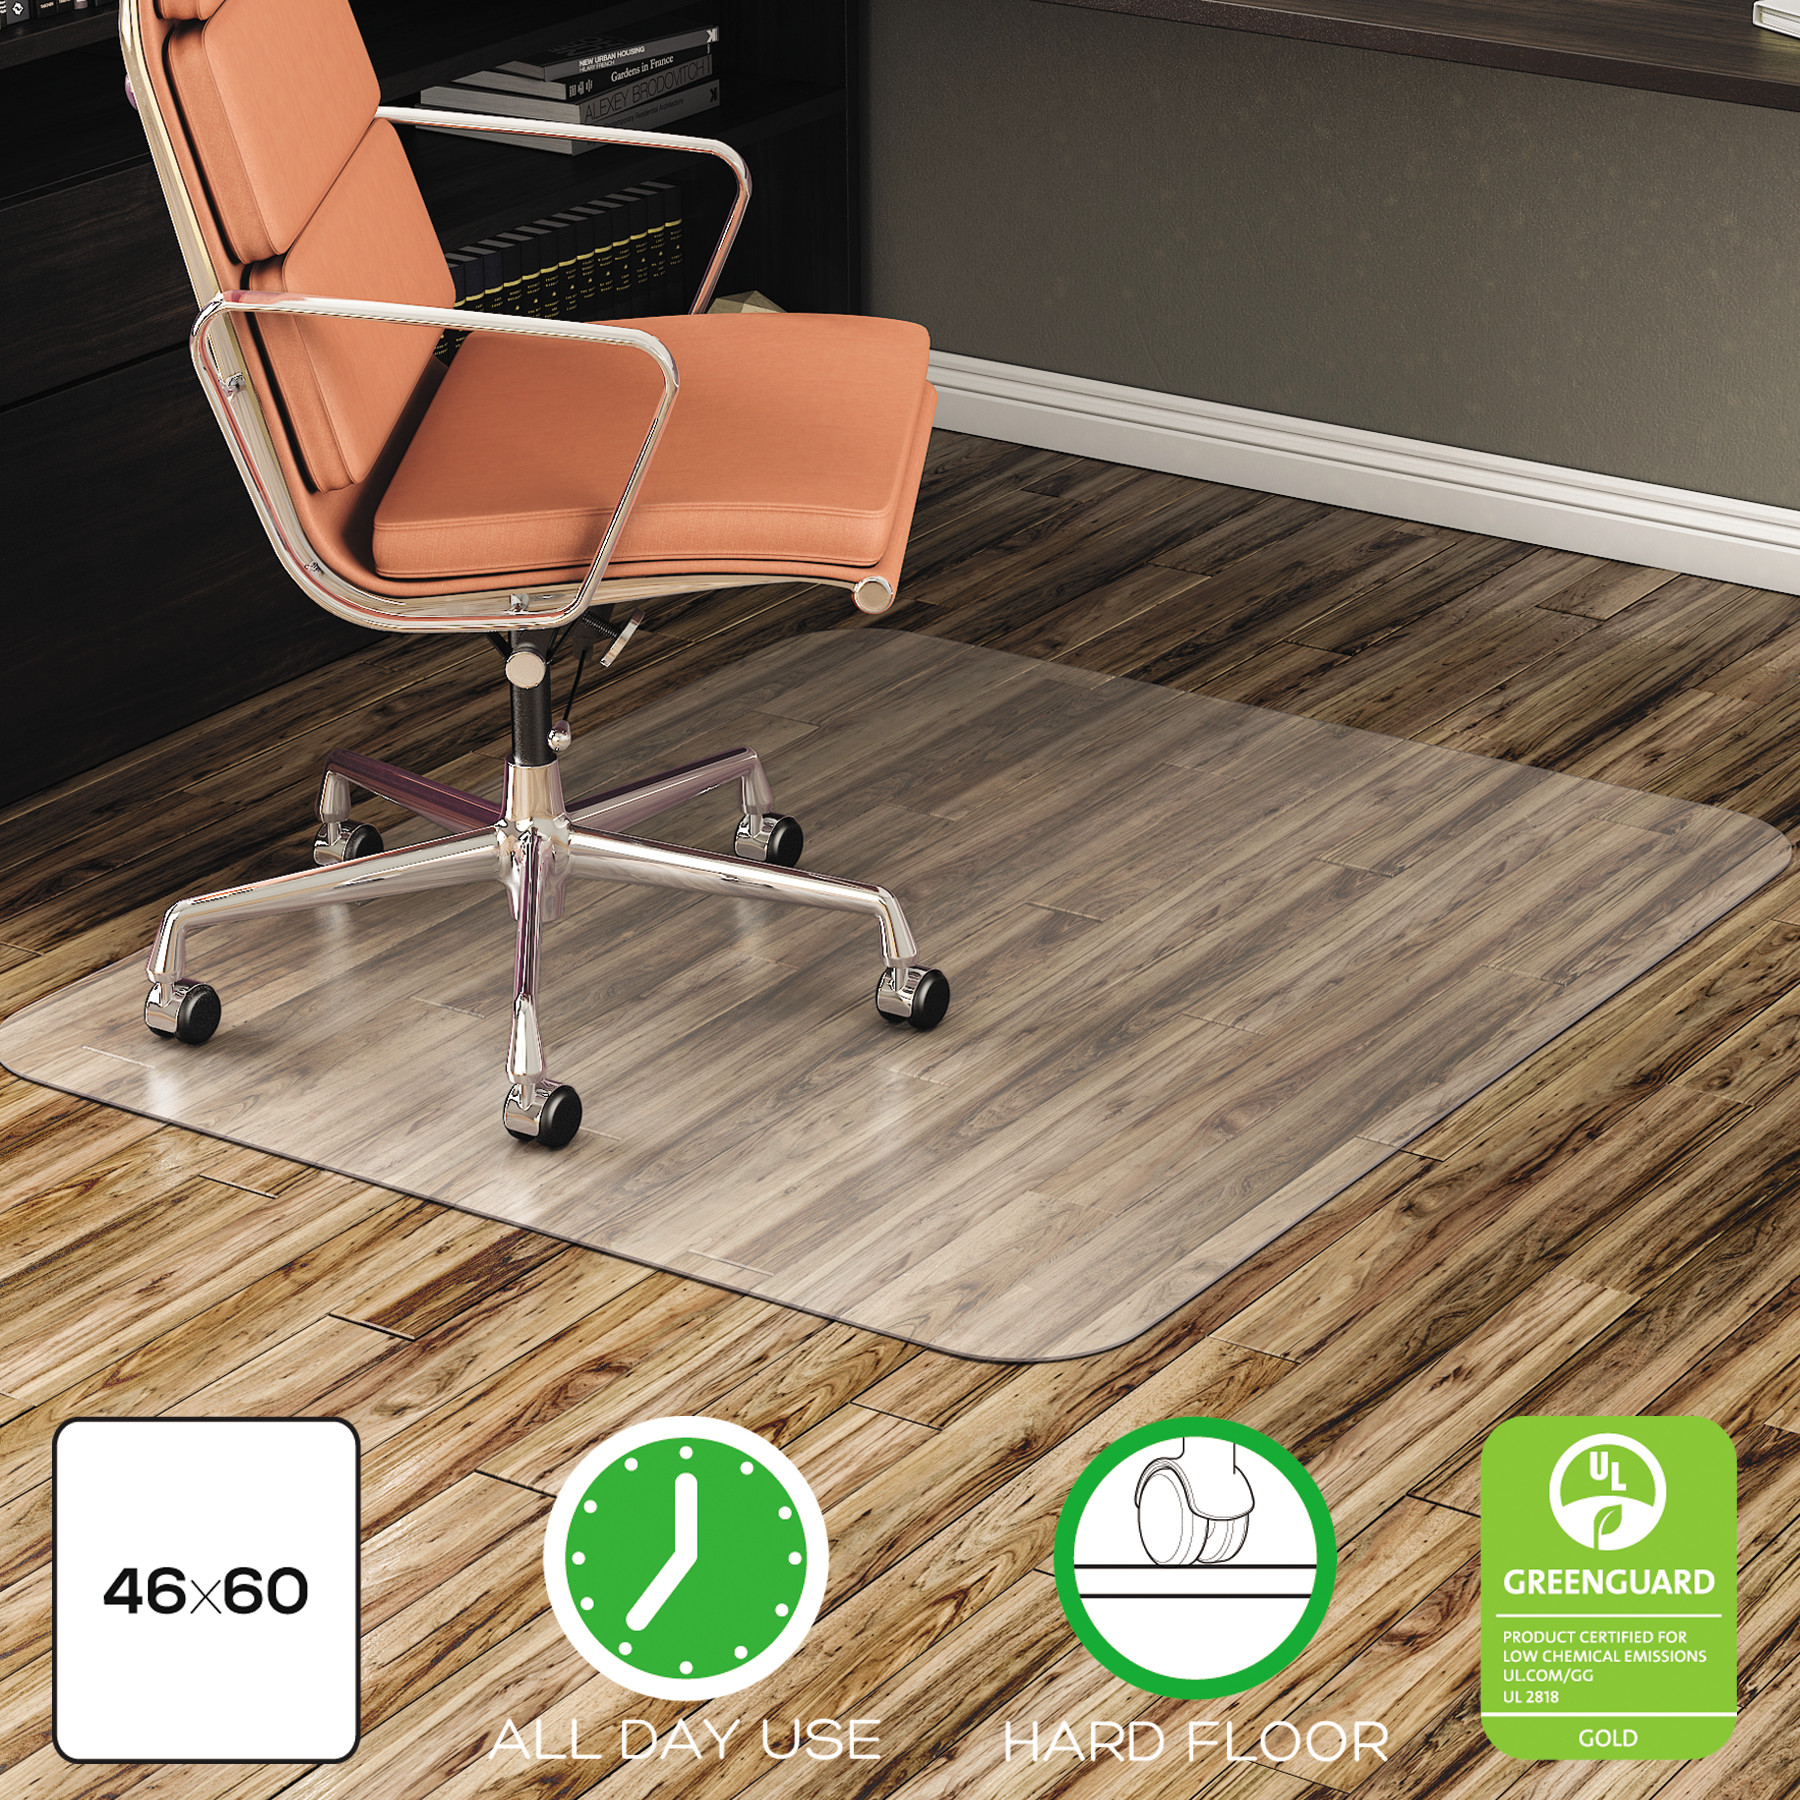 Deflecto EconoMat 46 x 60 Chair Mat for Hard Floor, Rectangular